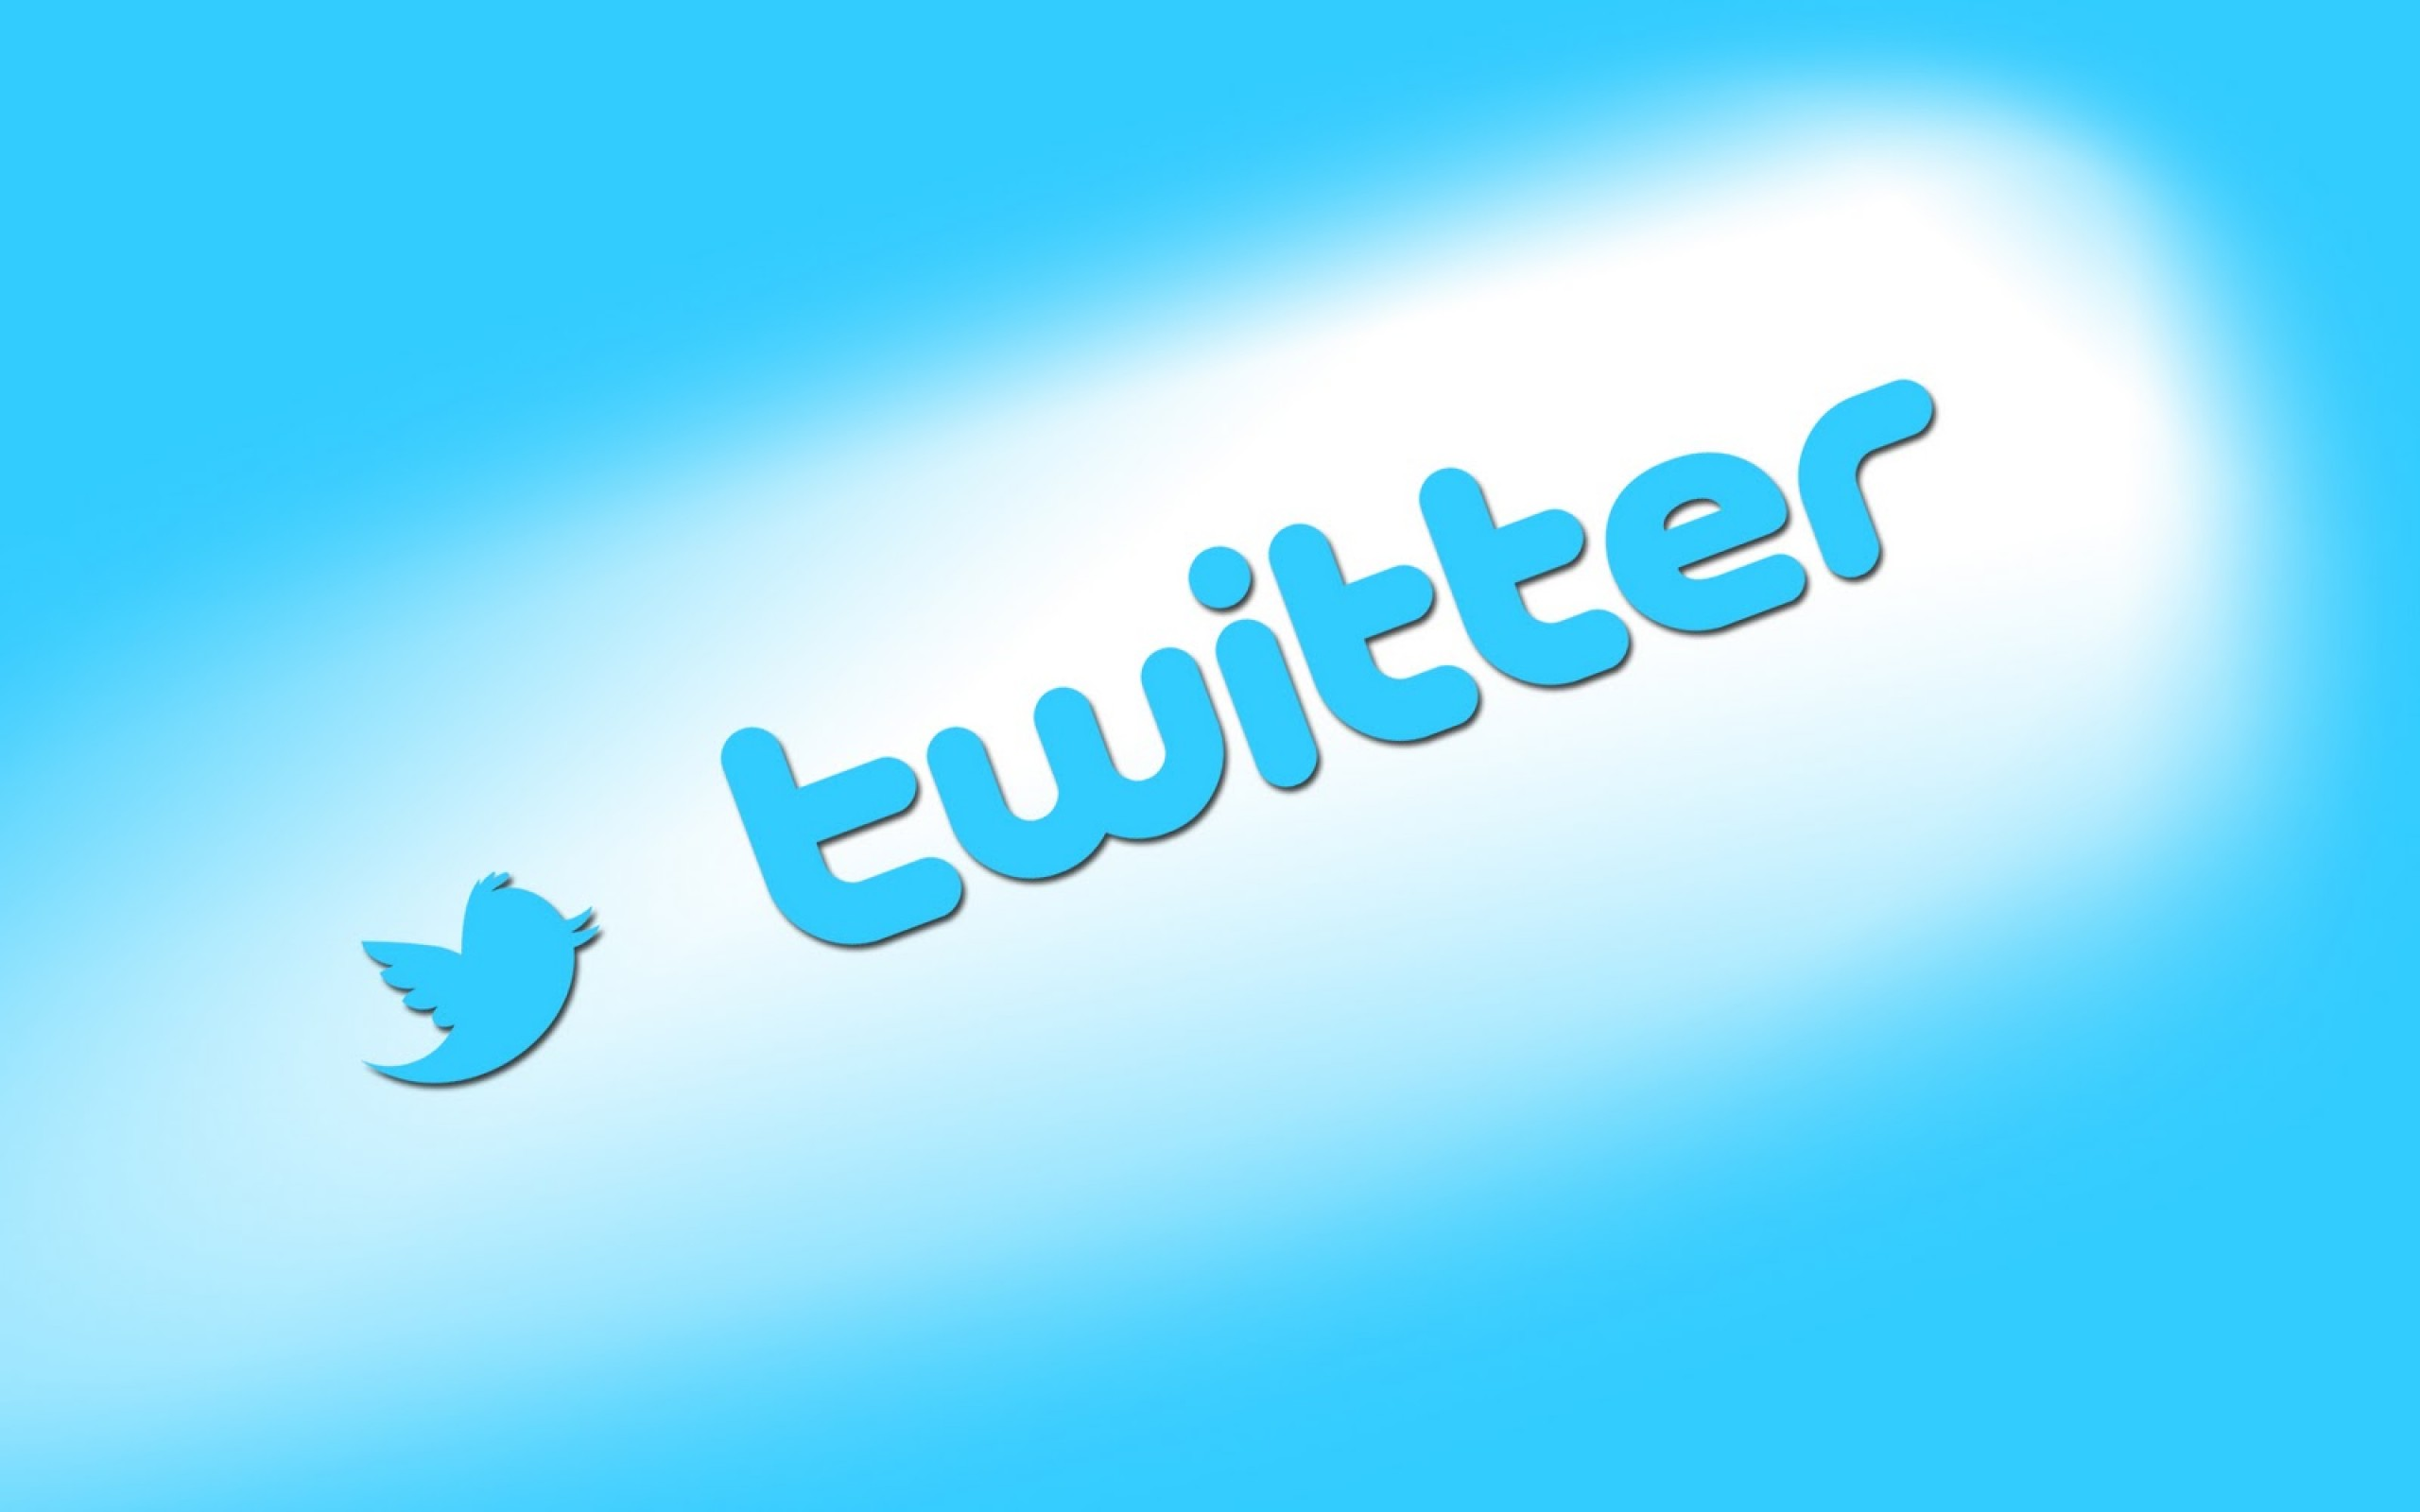 Social Media Twitter Logo Icon Wallpapers HD for Backgrounds Desktop 2560x1600